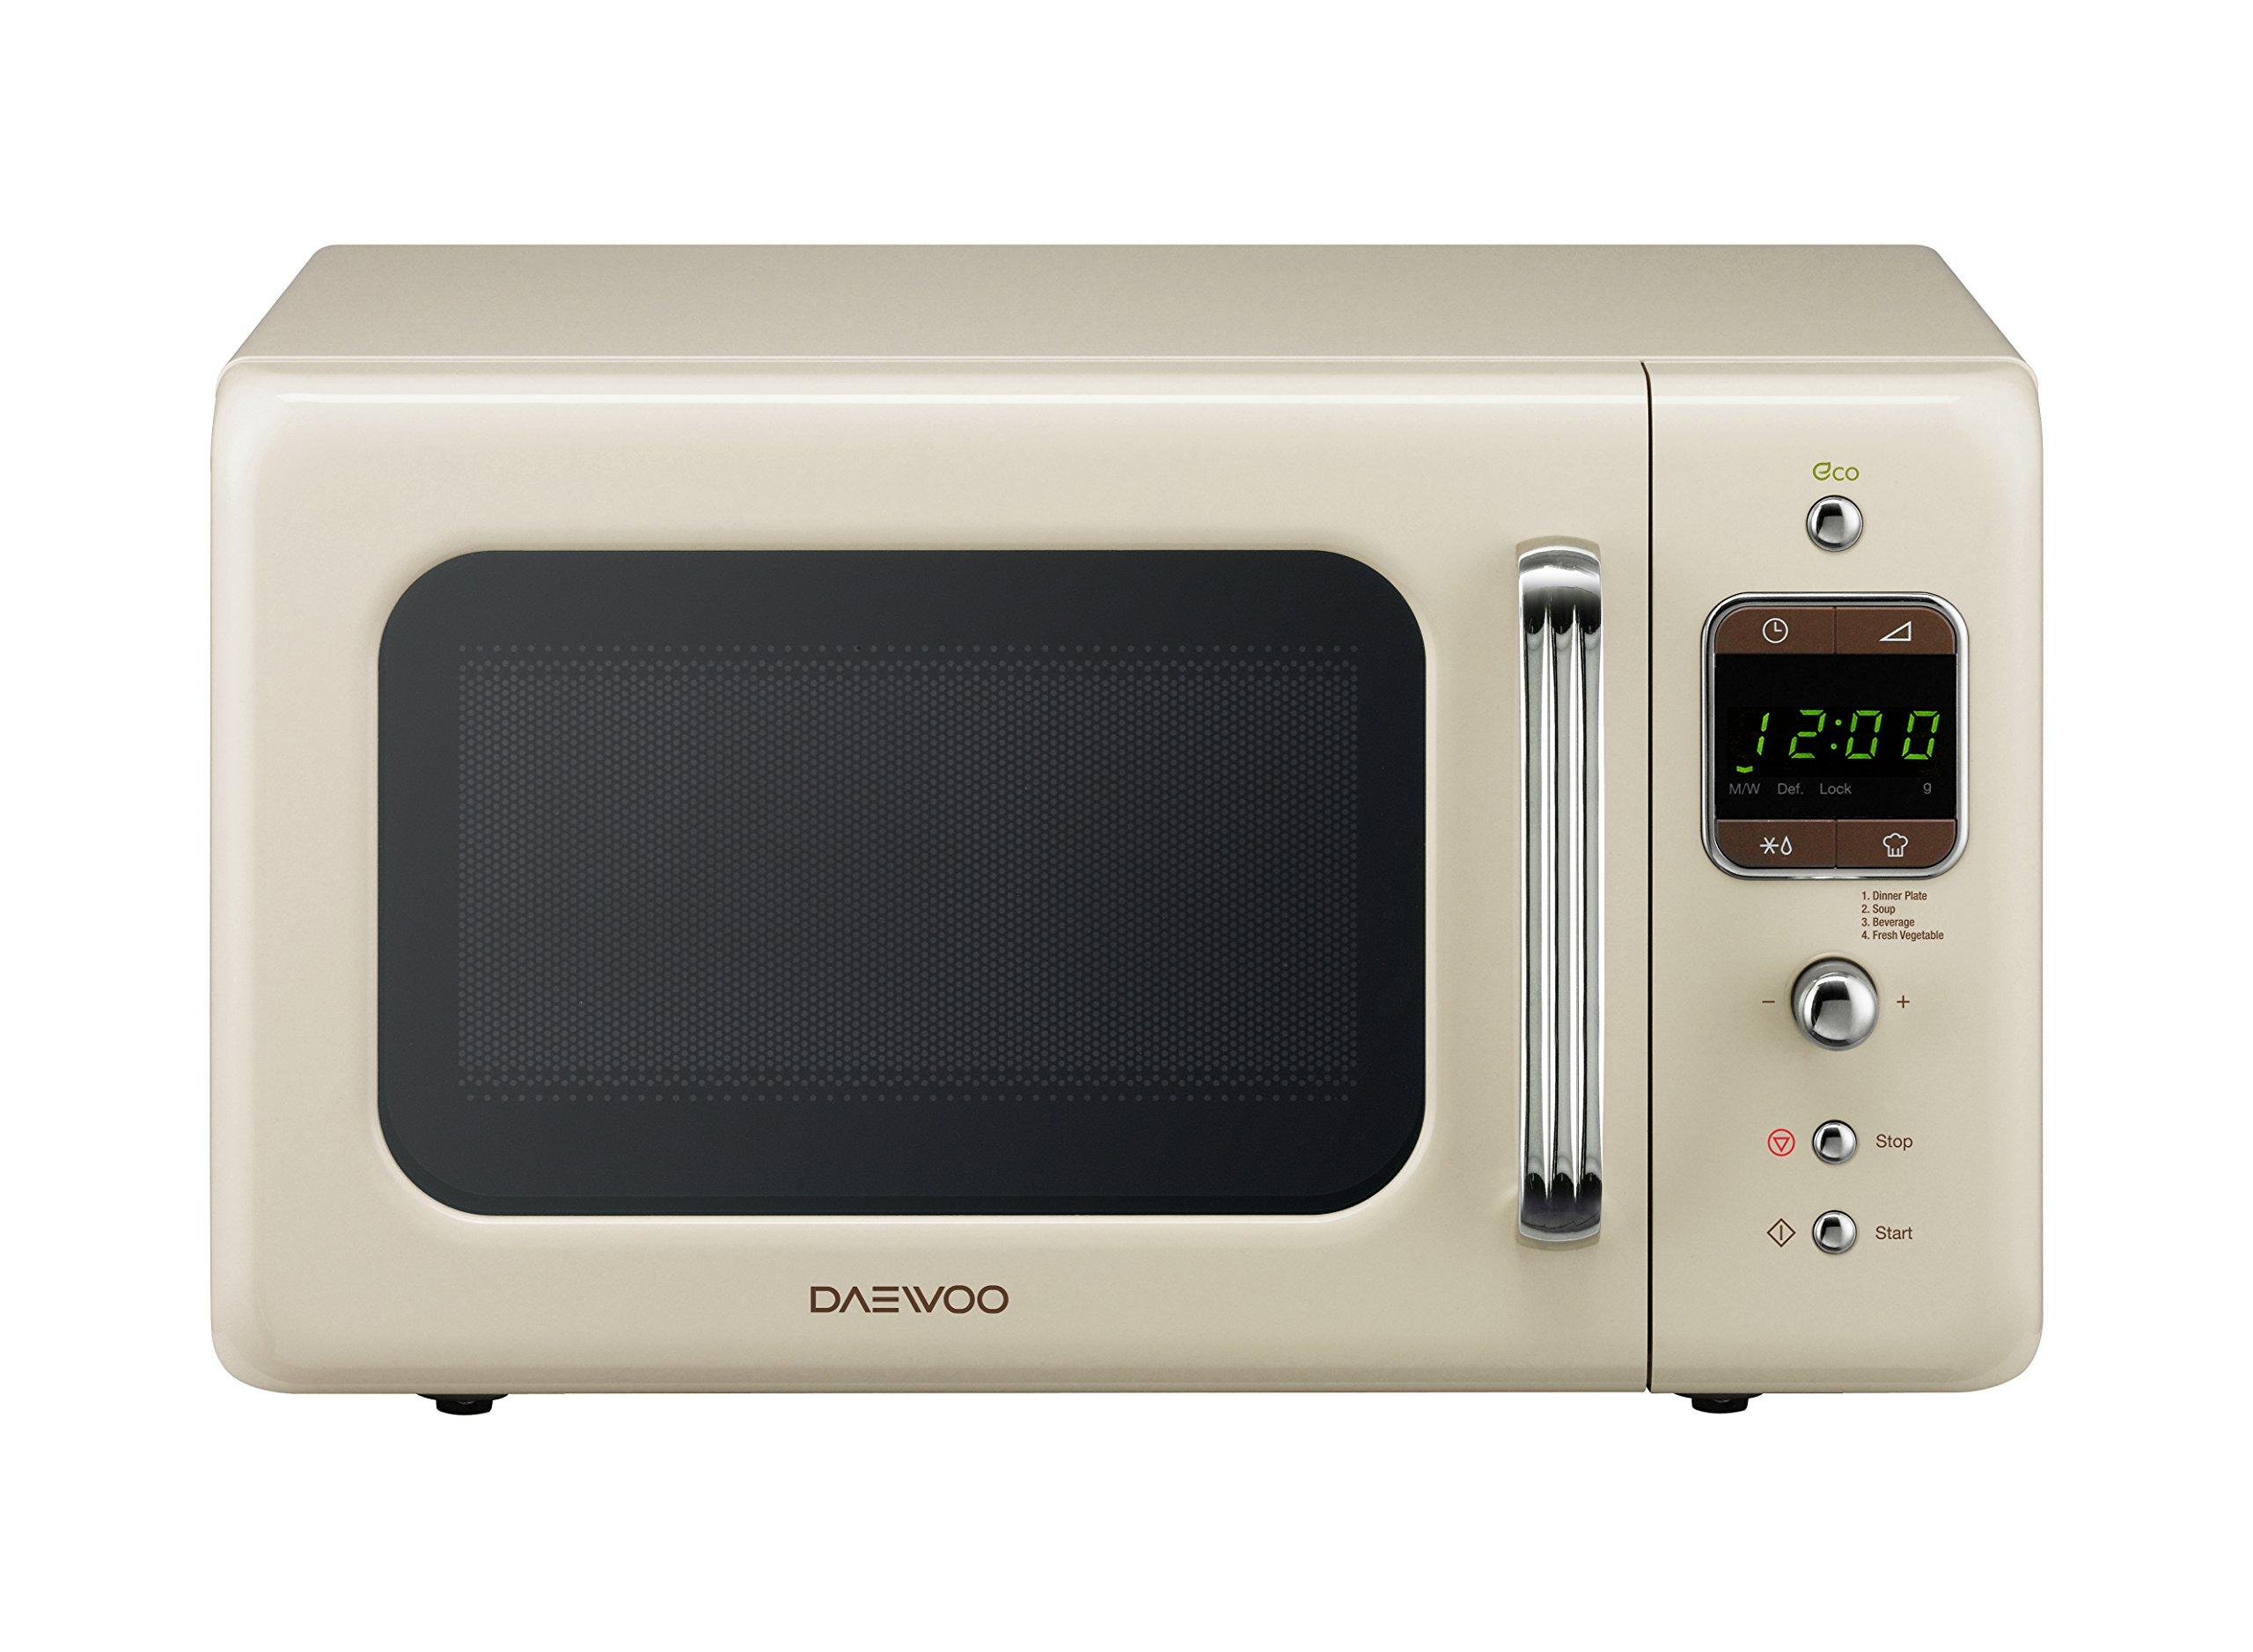 Daewoo Kor7lbkc Retro Style Microwave Oven 20 L 800 W